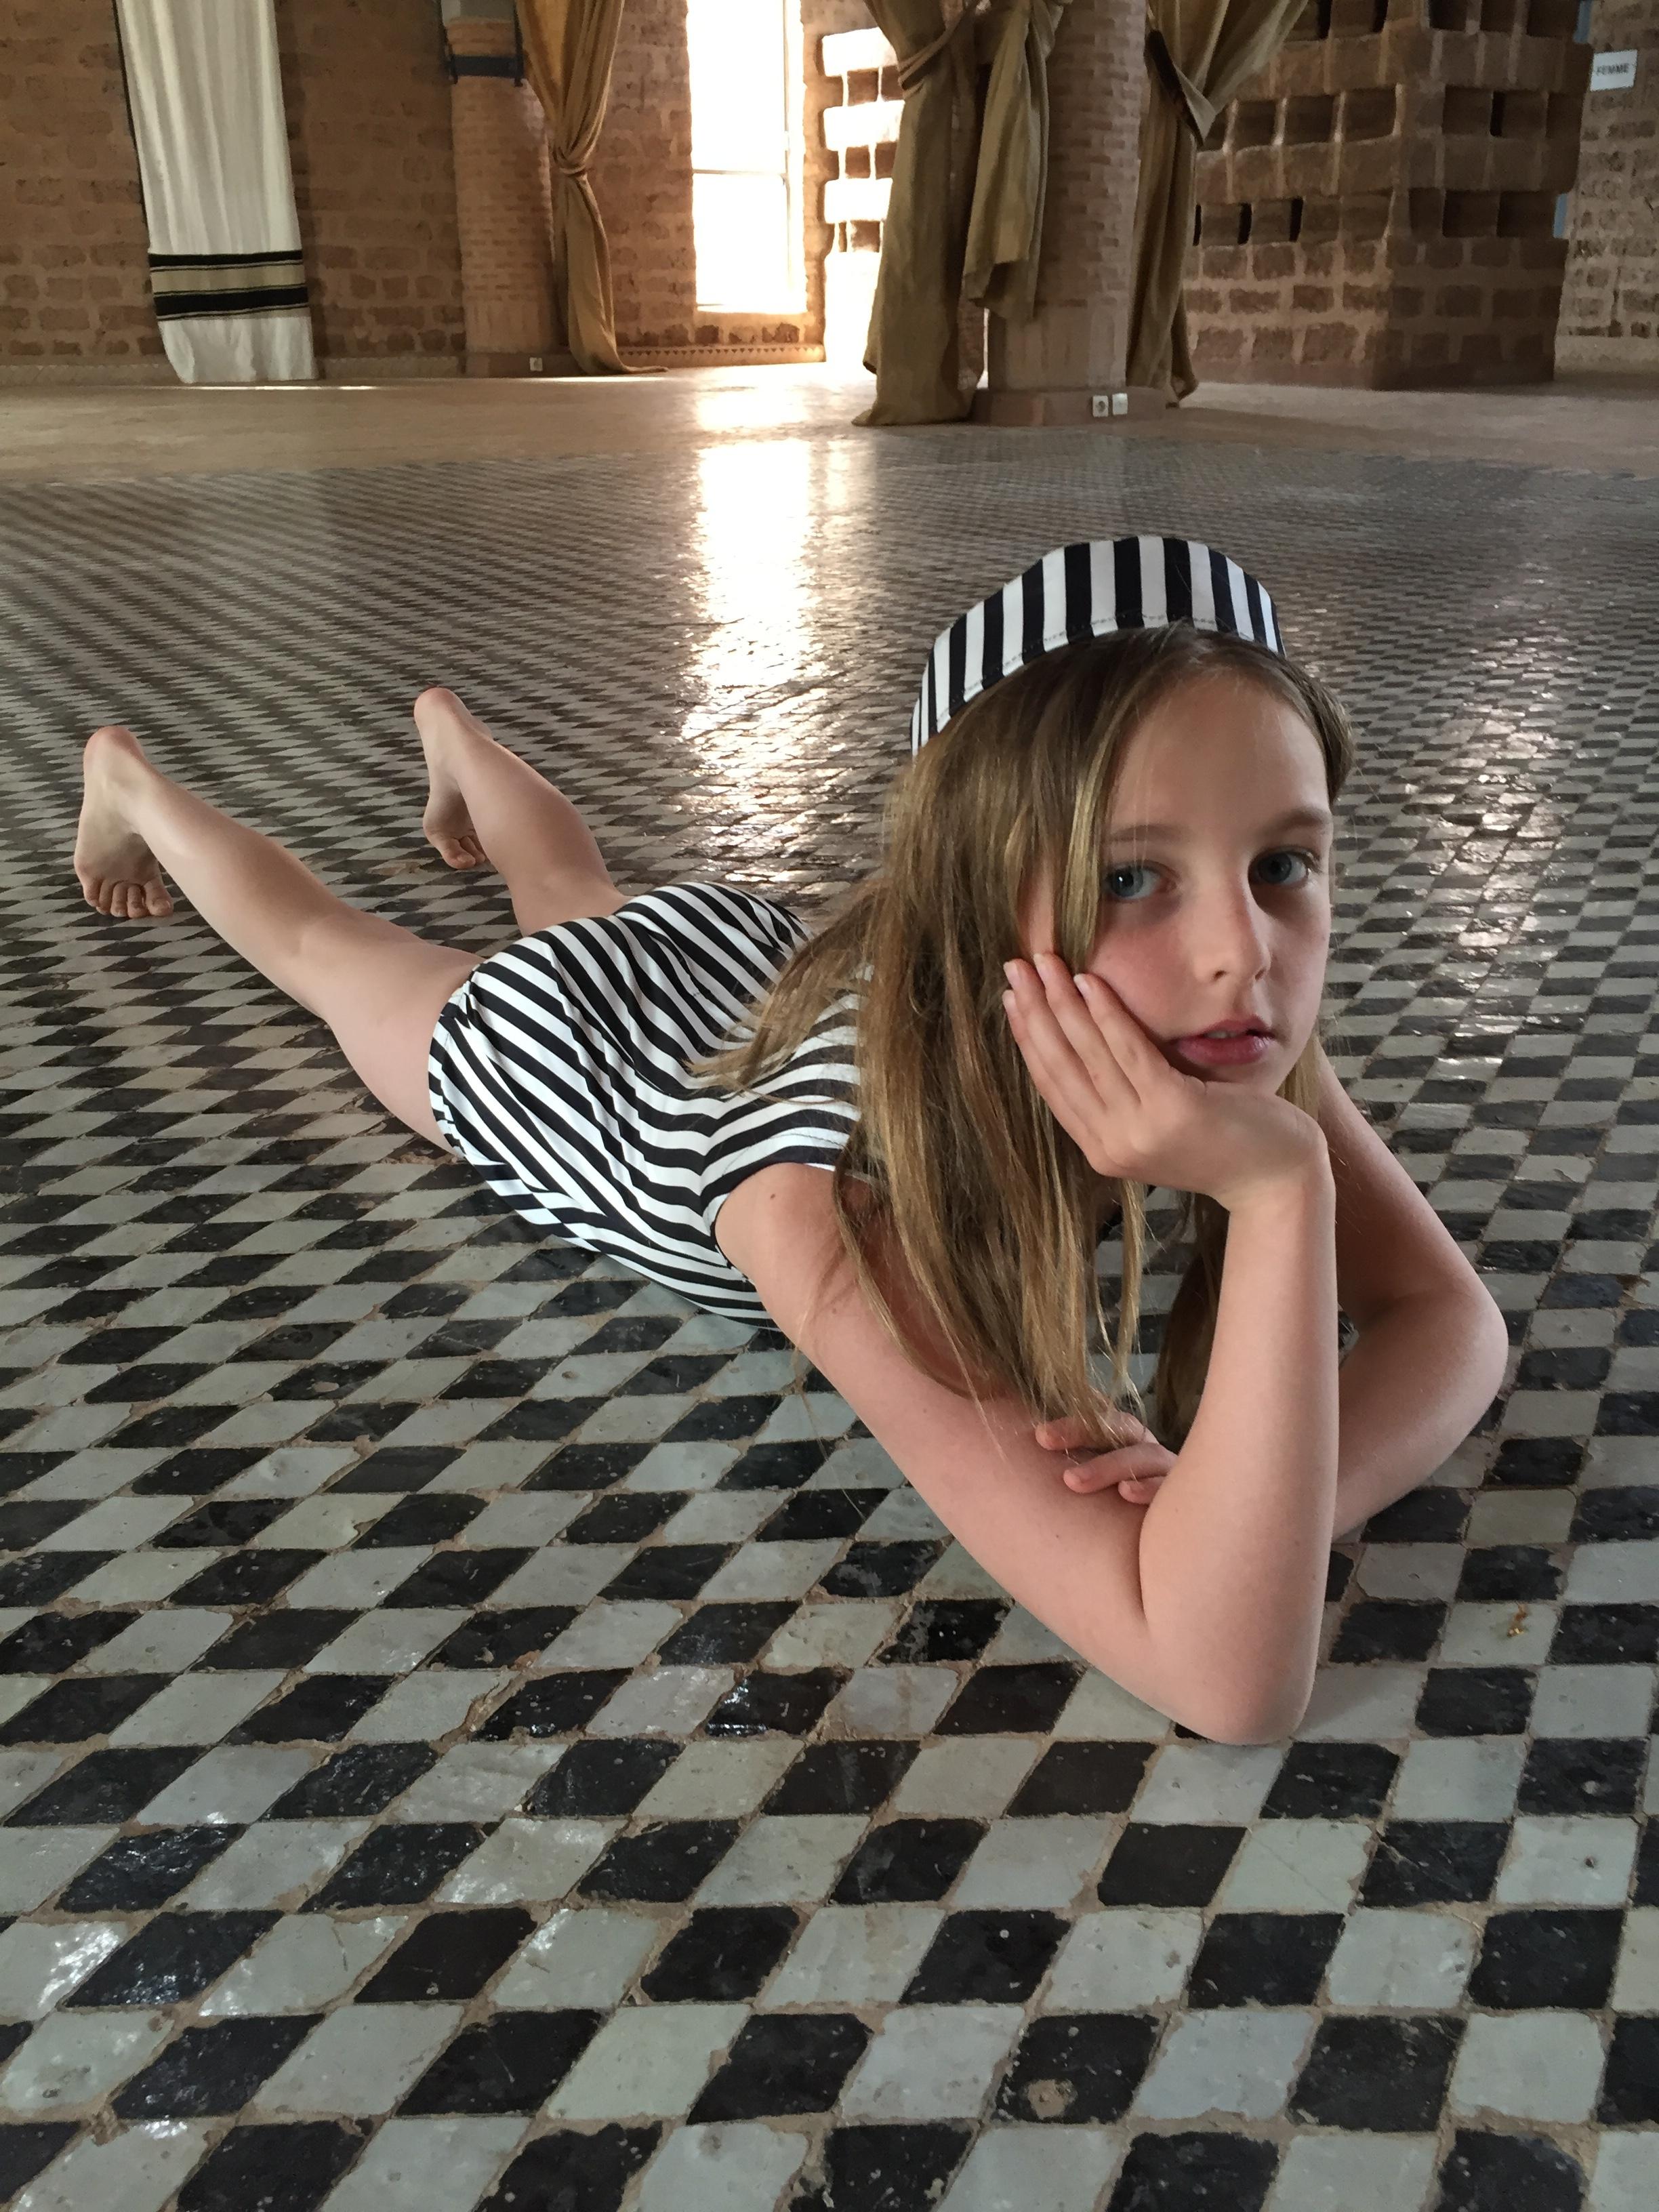 pearl lowe - photo #47